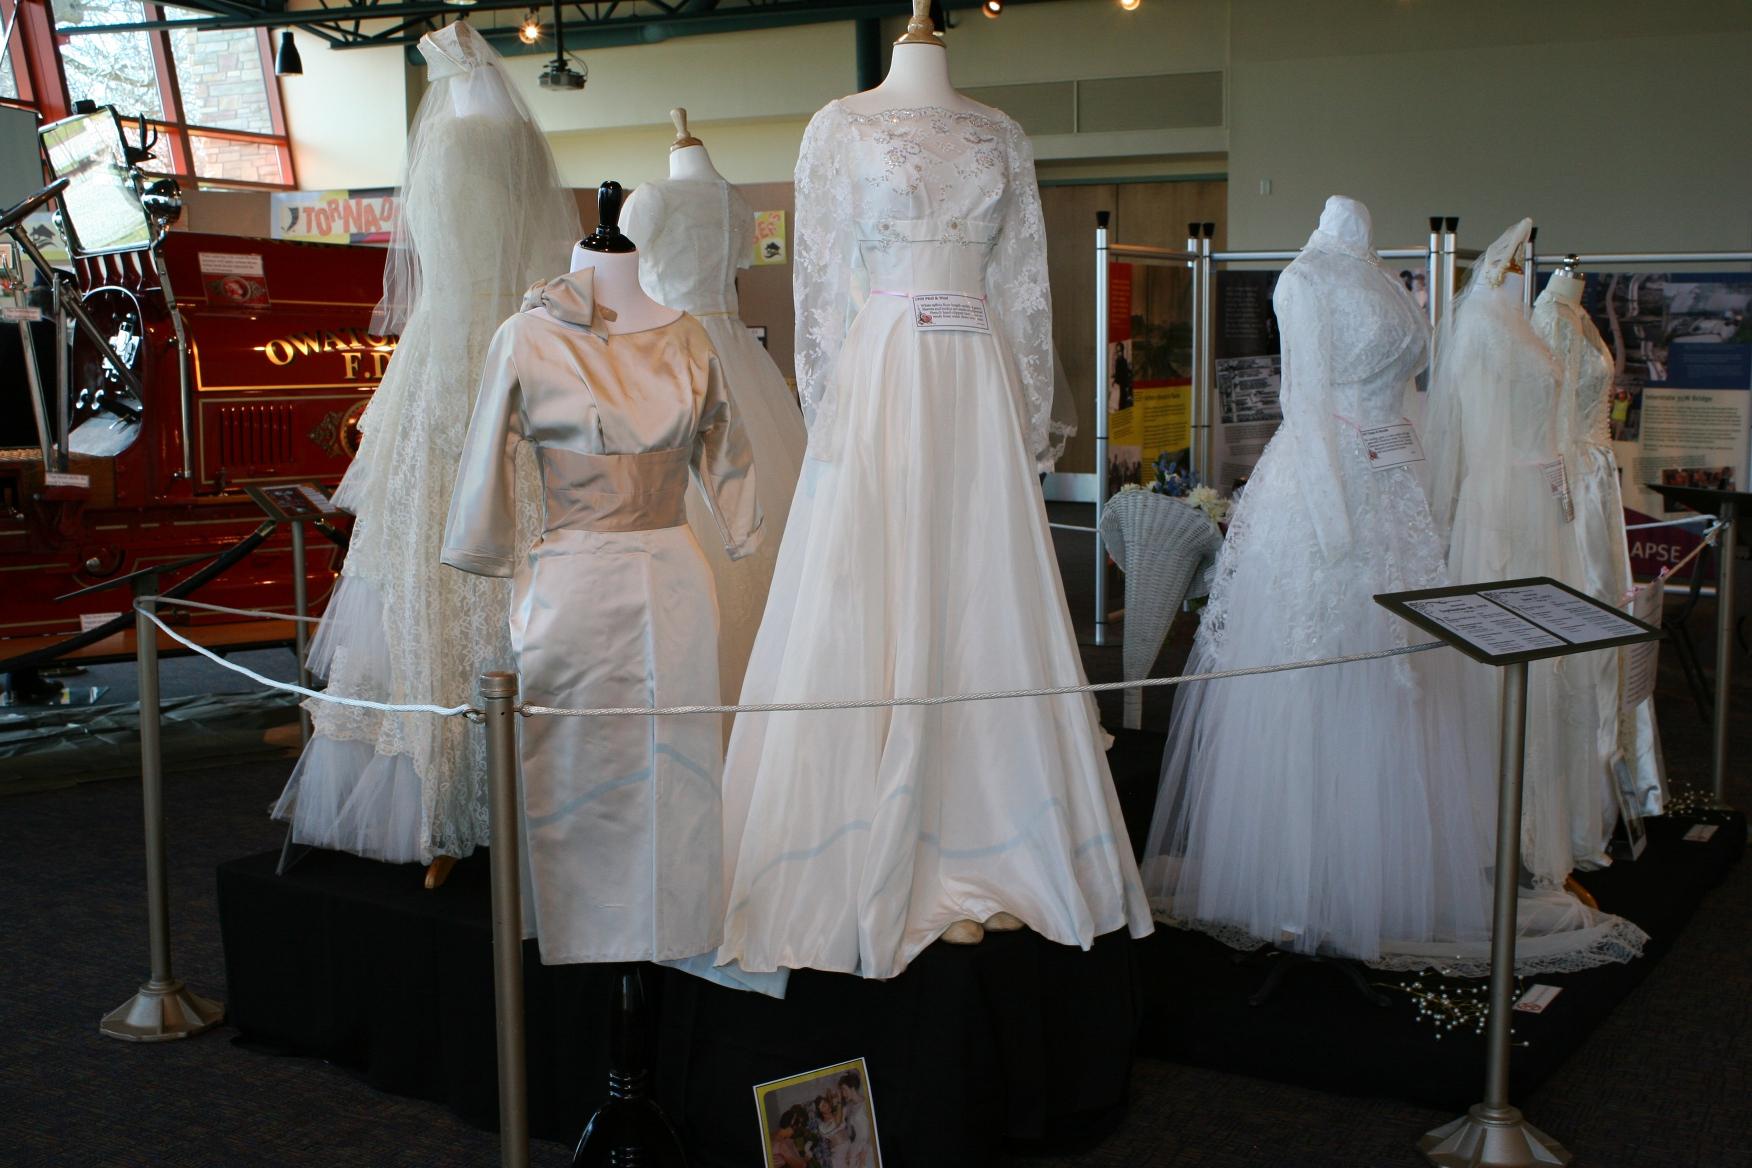 Exhibit, wedding dresses, 67 group of 1950s wedding dresses ...